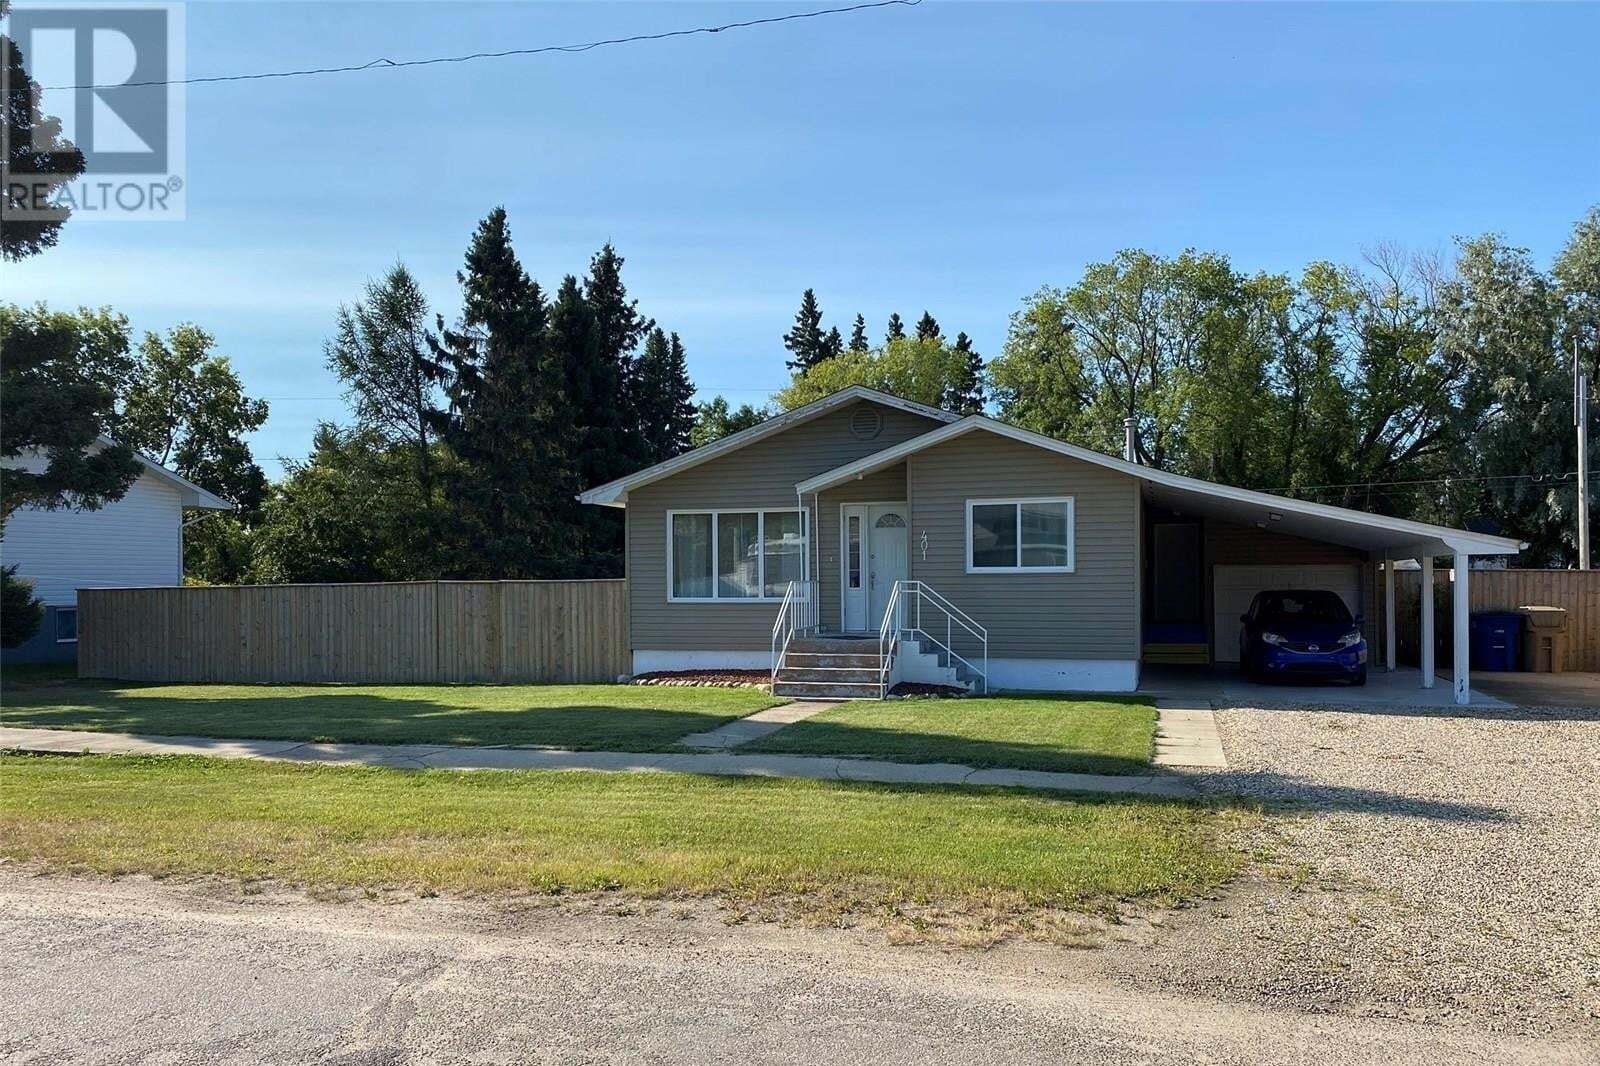 House for sale at 401 4th Ave E Shellbrook Saskatchewan - MLS: SK824666